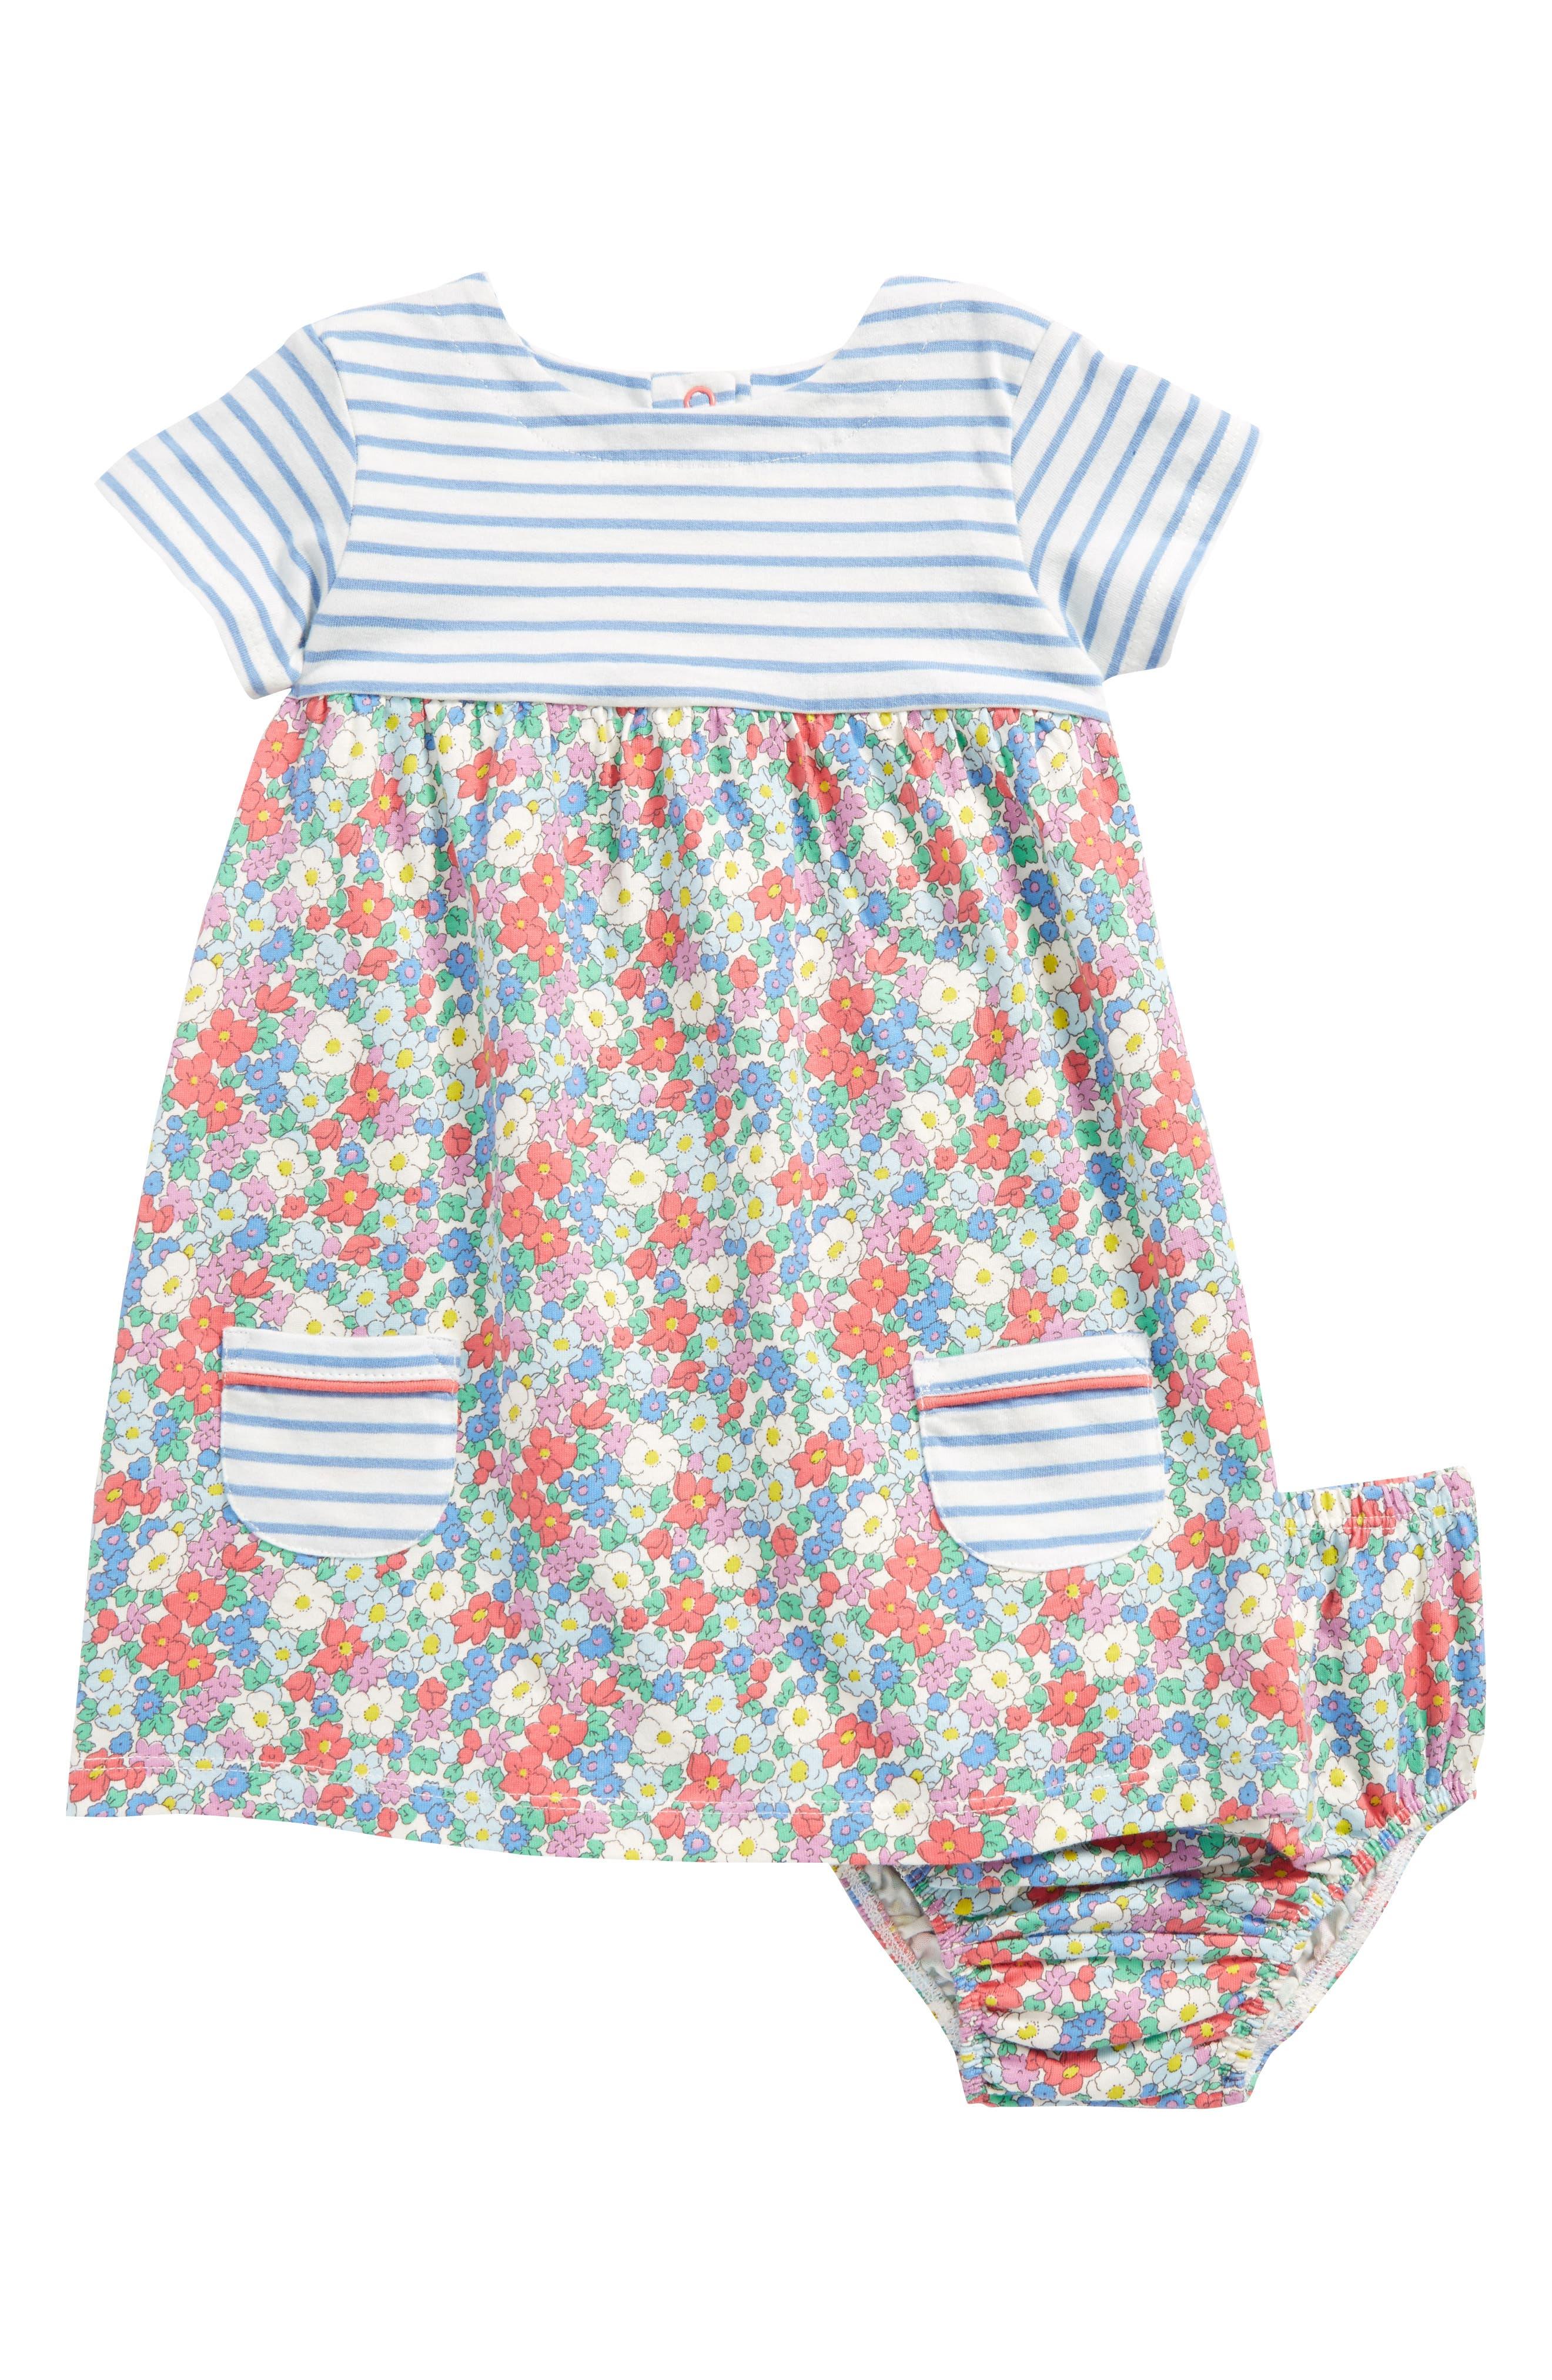 Hotchpotch Dress,                         Main,                         color,